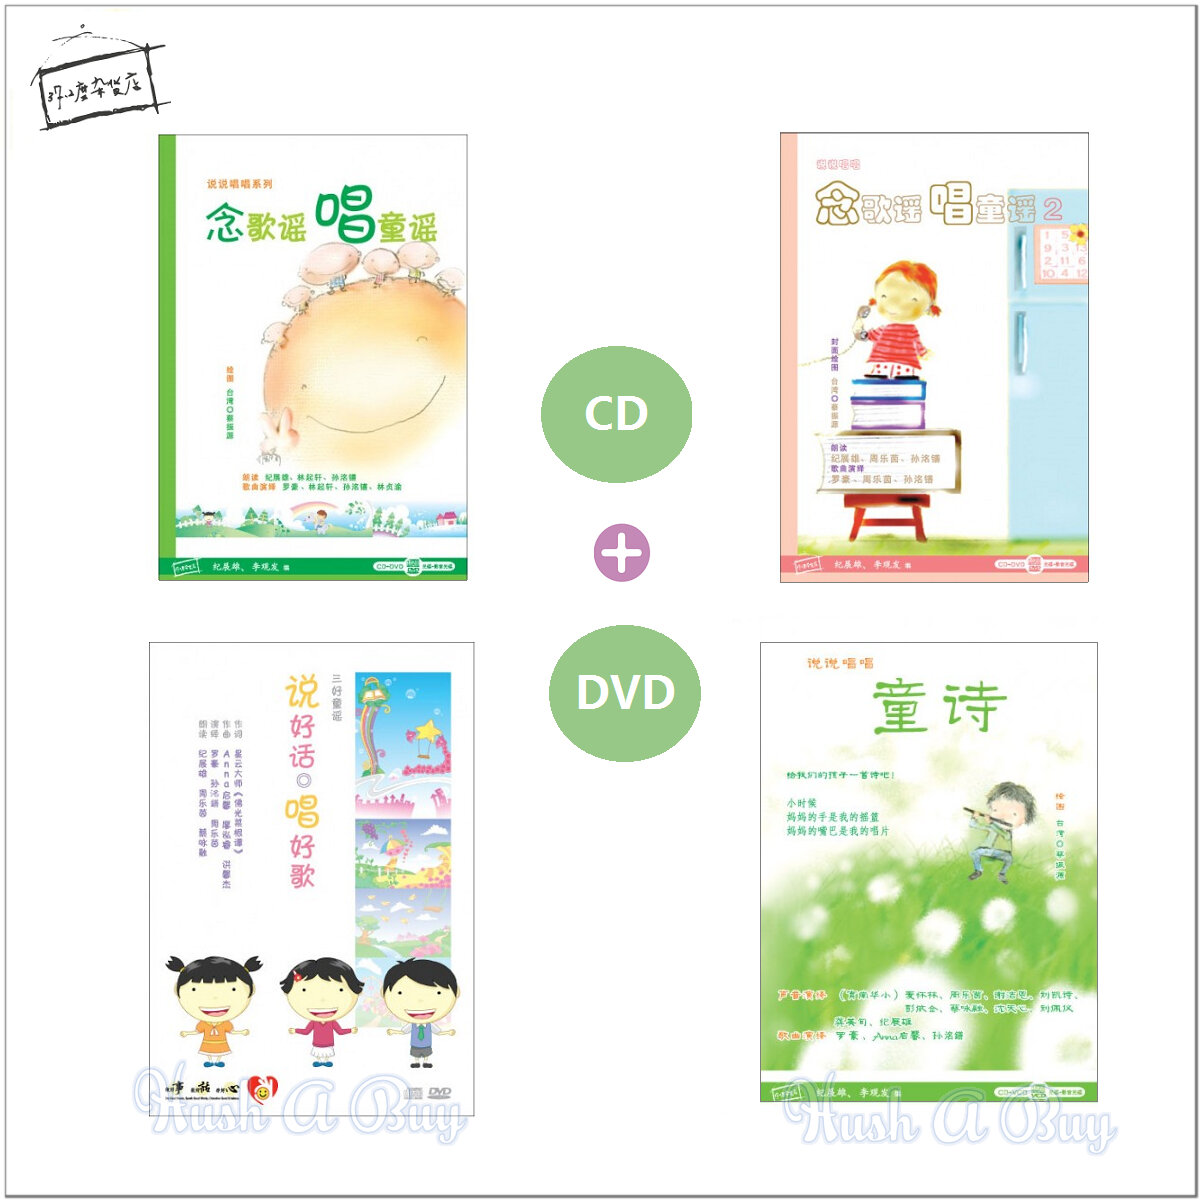 Warm372 37.2度杂货店说说唱唱 ( CD+DVD)念歌谣唱童谣1和2,说好话唱好歌,童诗